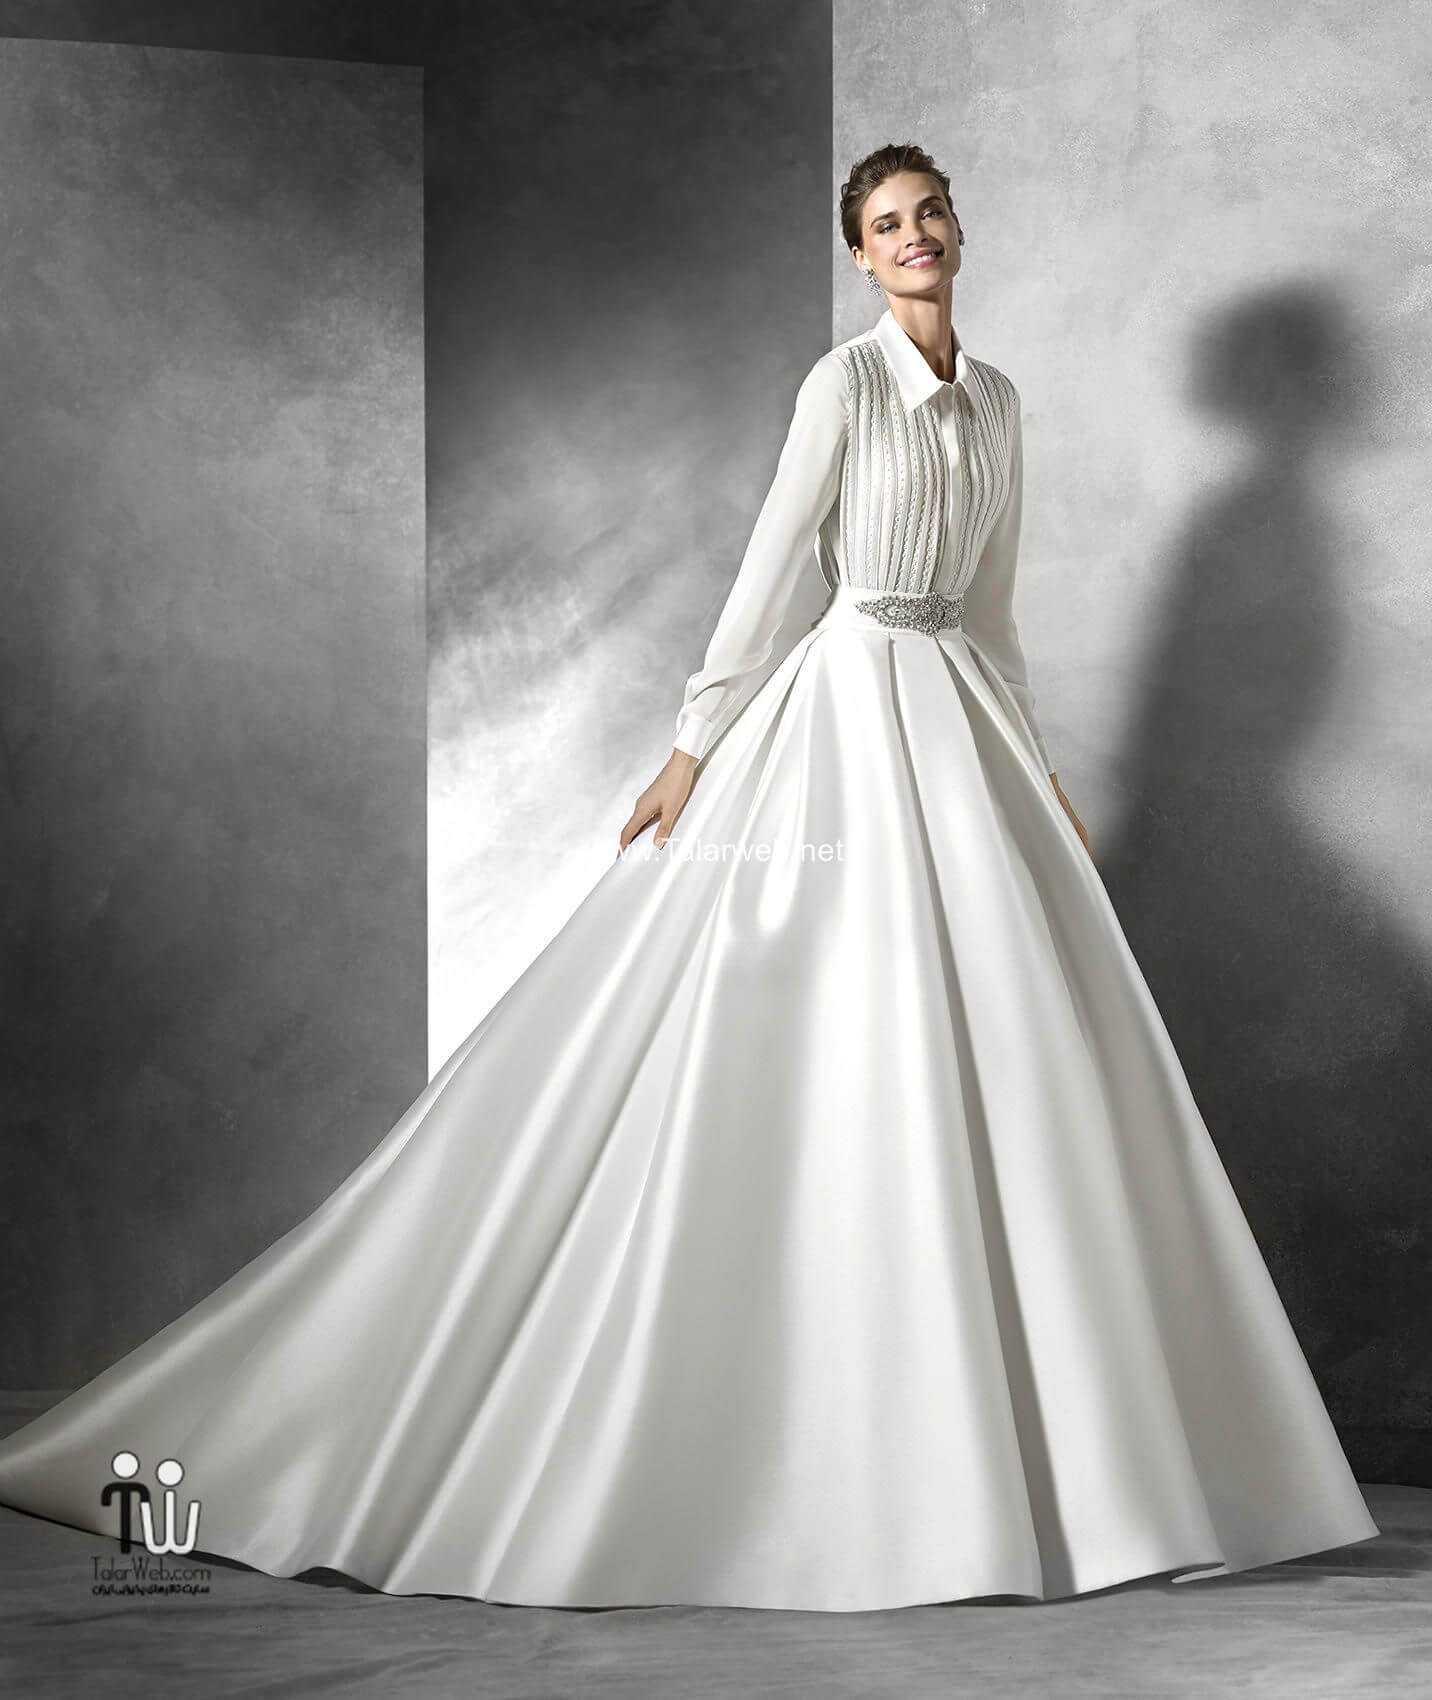 Wedding dresses bridal 2016 21 - مدل لباس عروس ۲۰۱۶ - سری۲